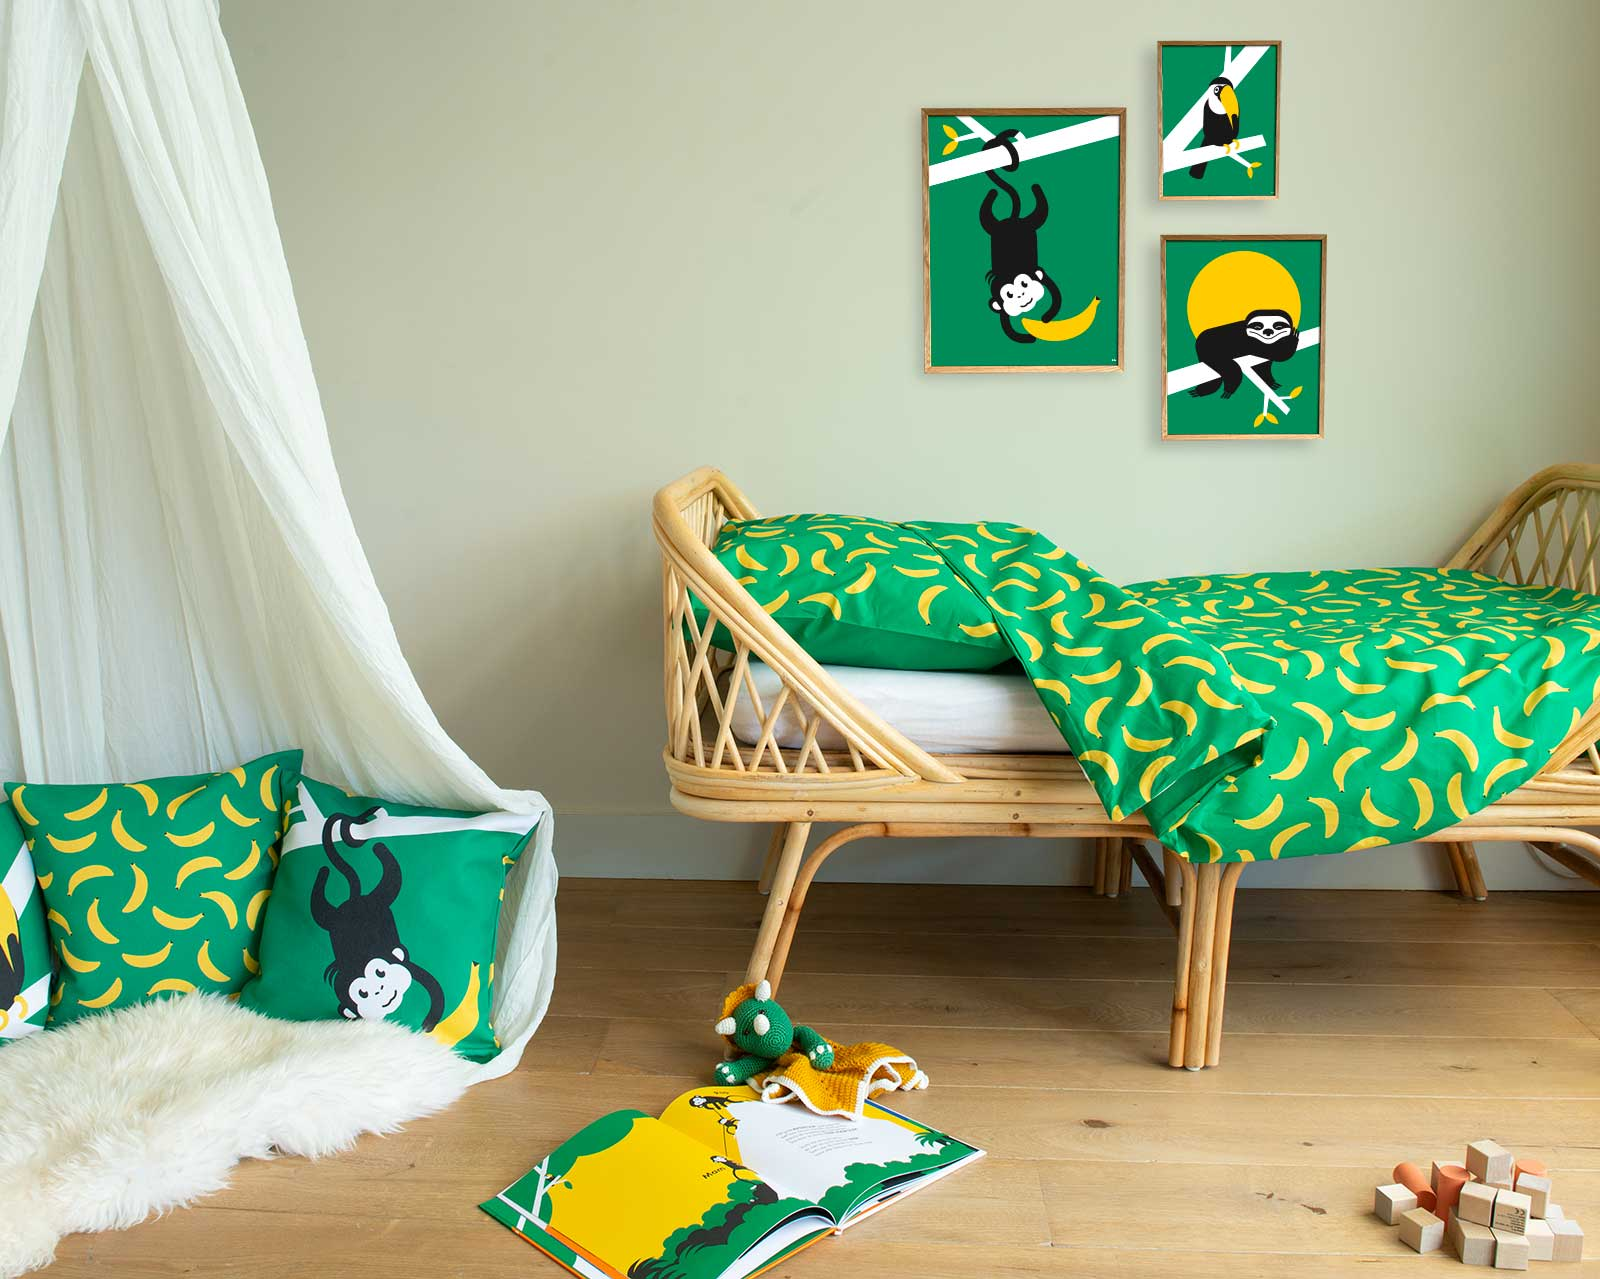 Peuter junior dekbedovertrek aapje Pie groen 120 x 150 Let's go bananas Kinderkamer rotan